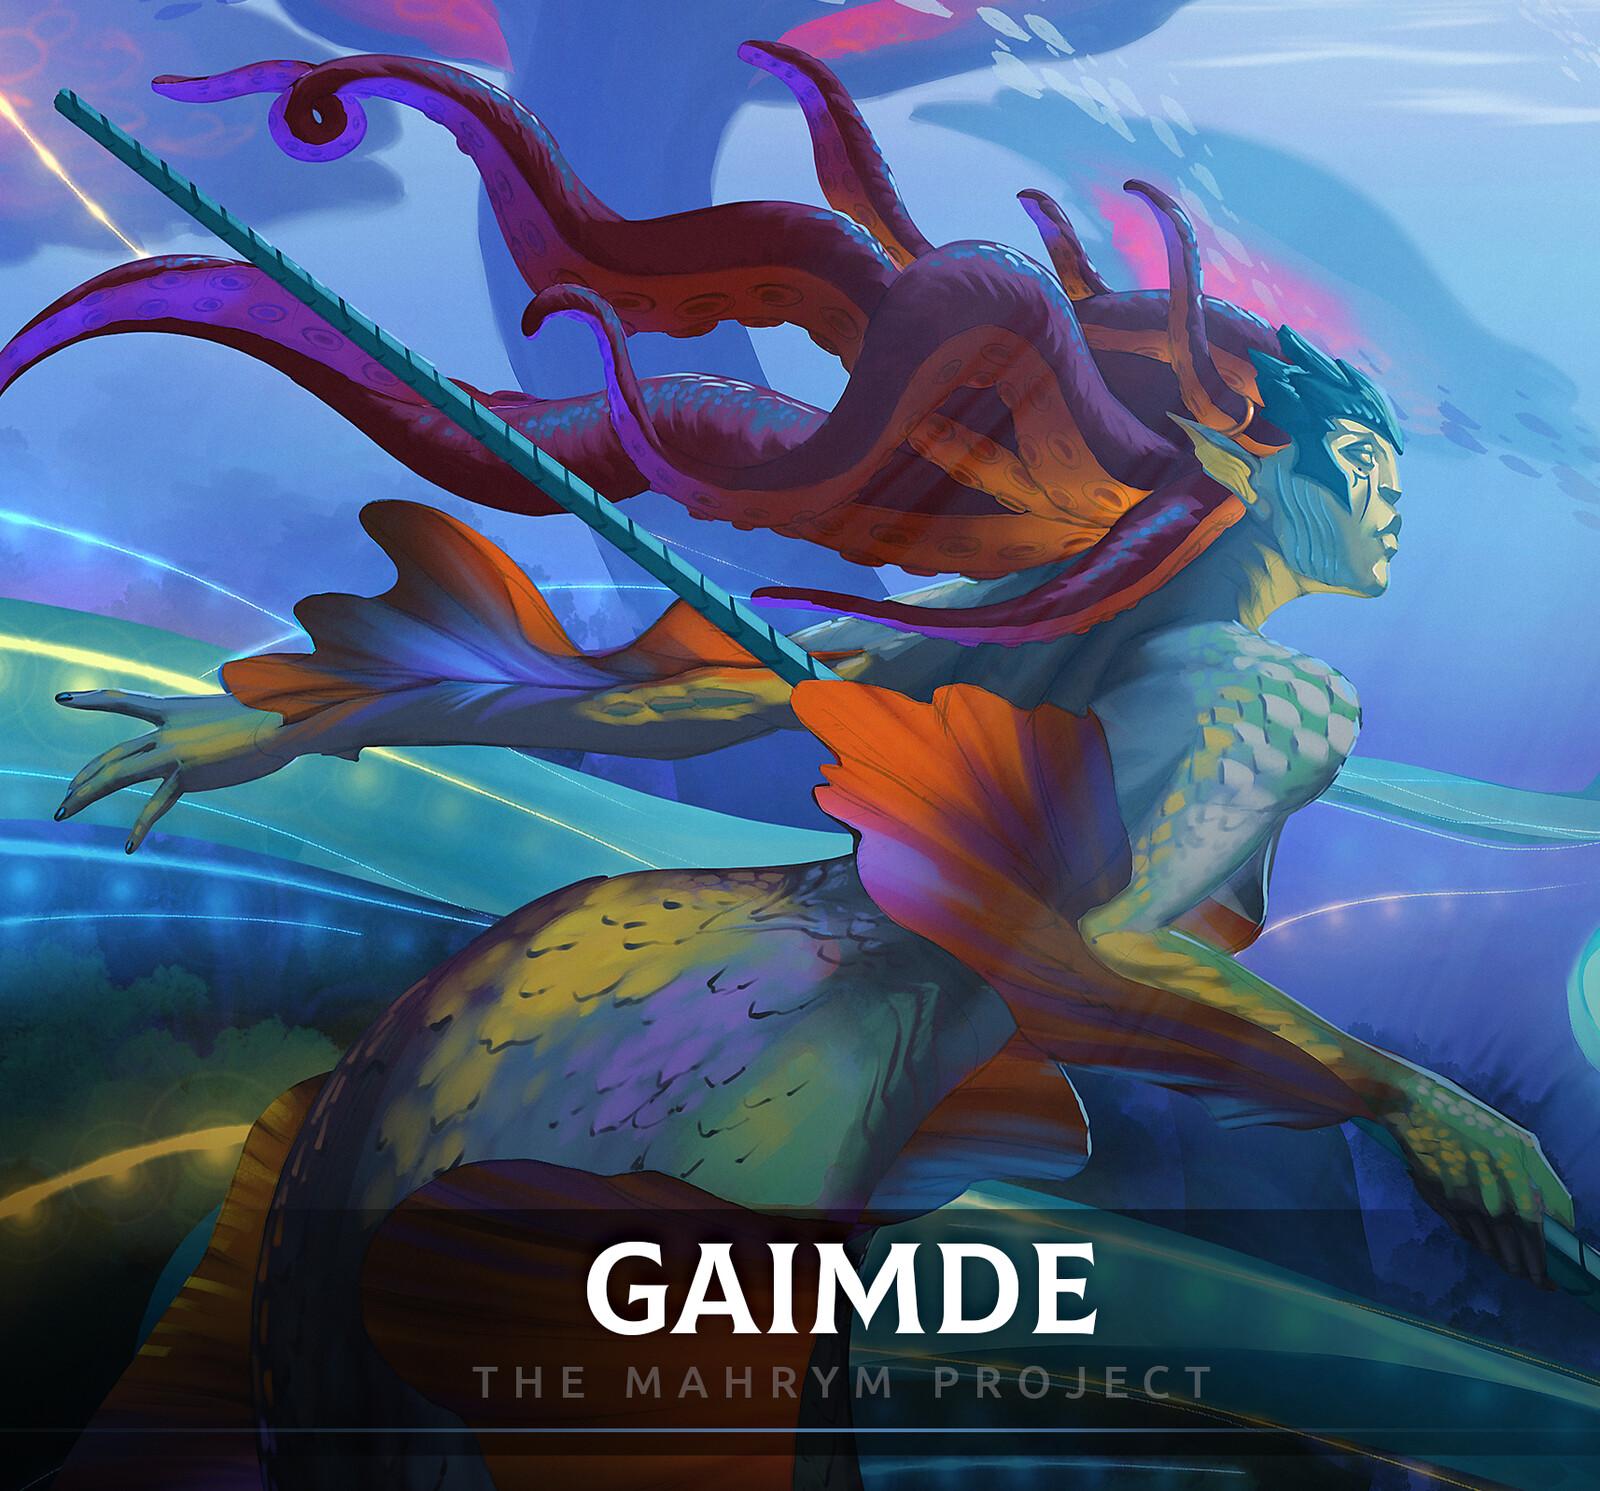 Gaimde - Animated splash art